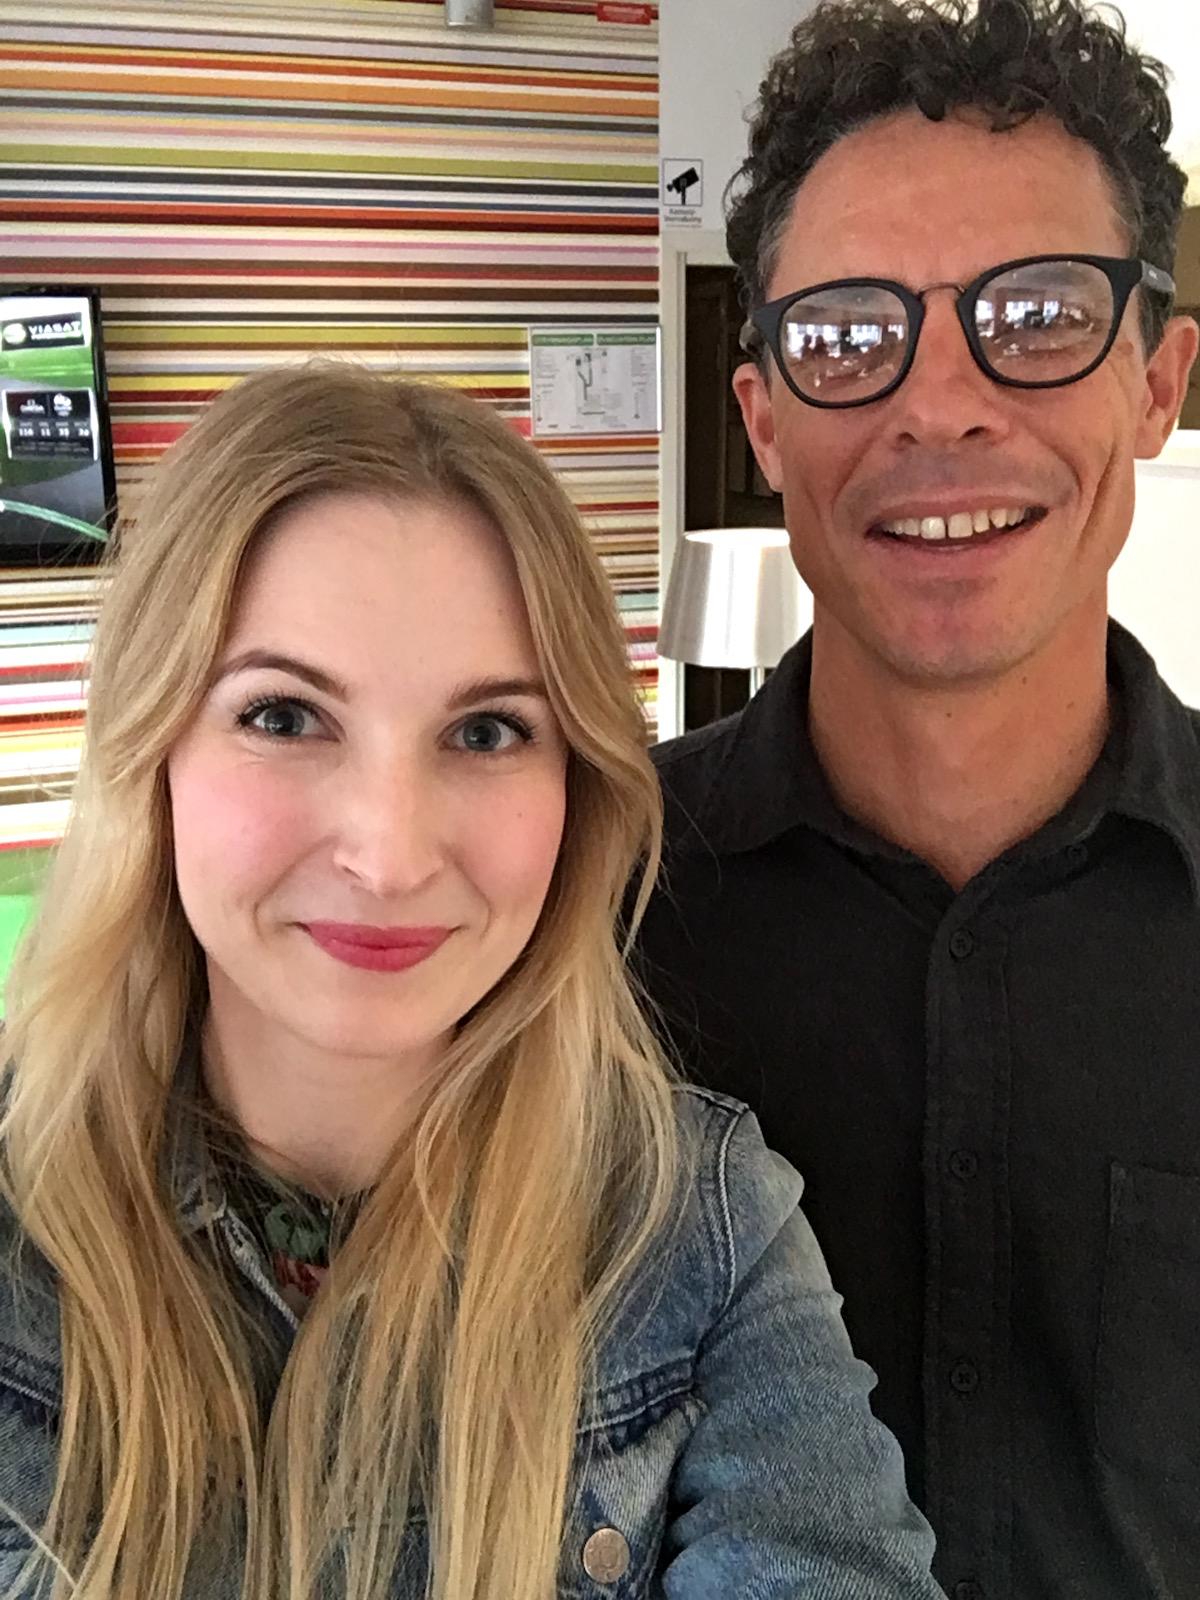 ESSE Probiotic Skincare Selfie Andrea Olofsson and Trevor Steyn|skonhetssnack.se